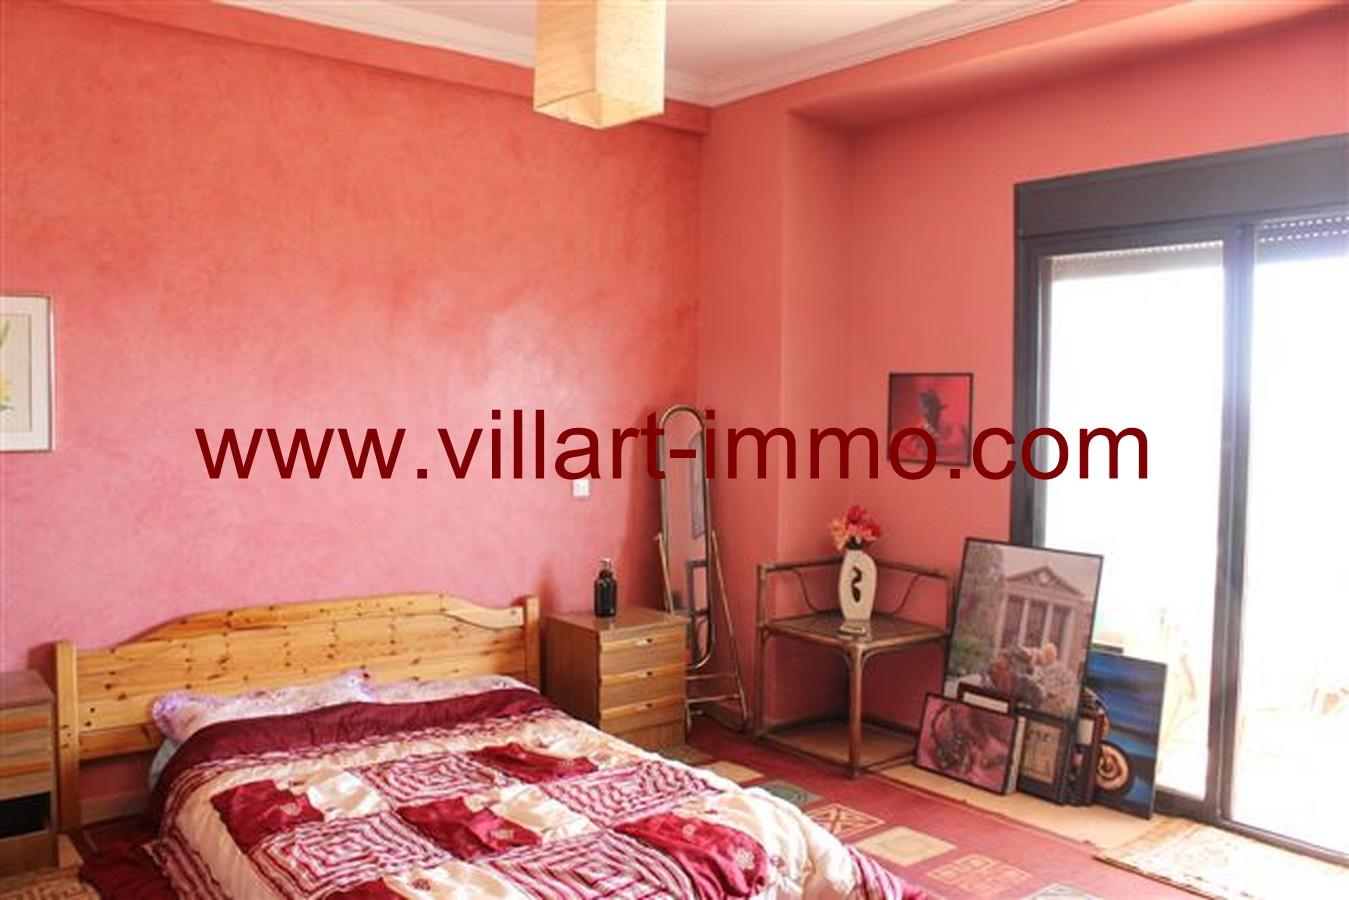 5-Vente-Appartement-Assilah-Autres-Chambre 2-VA49-Villart Immo